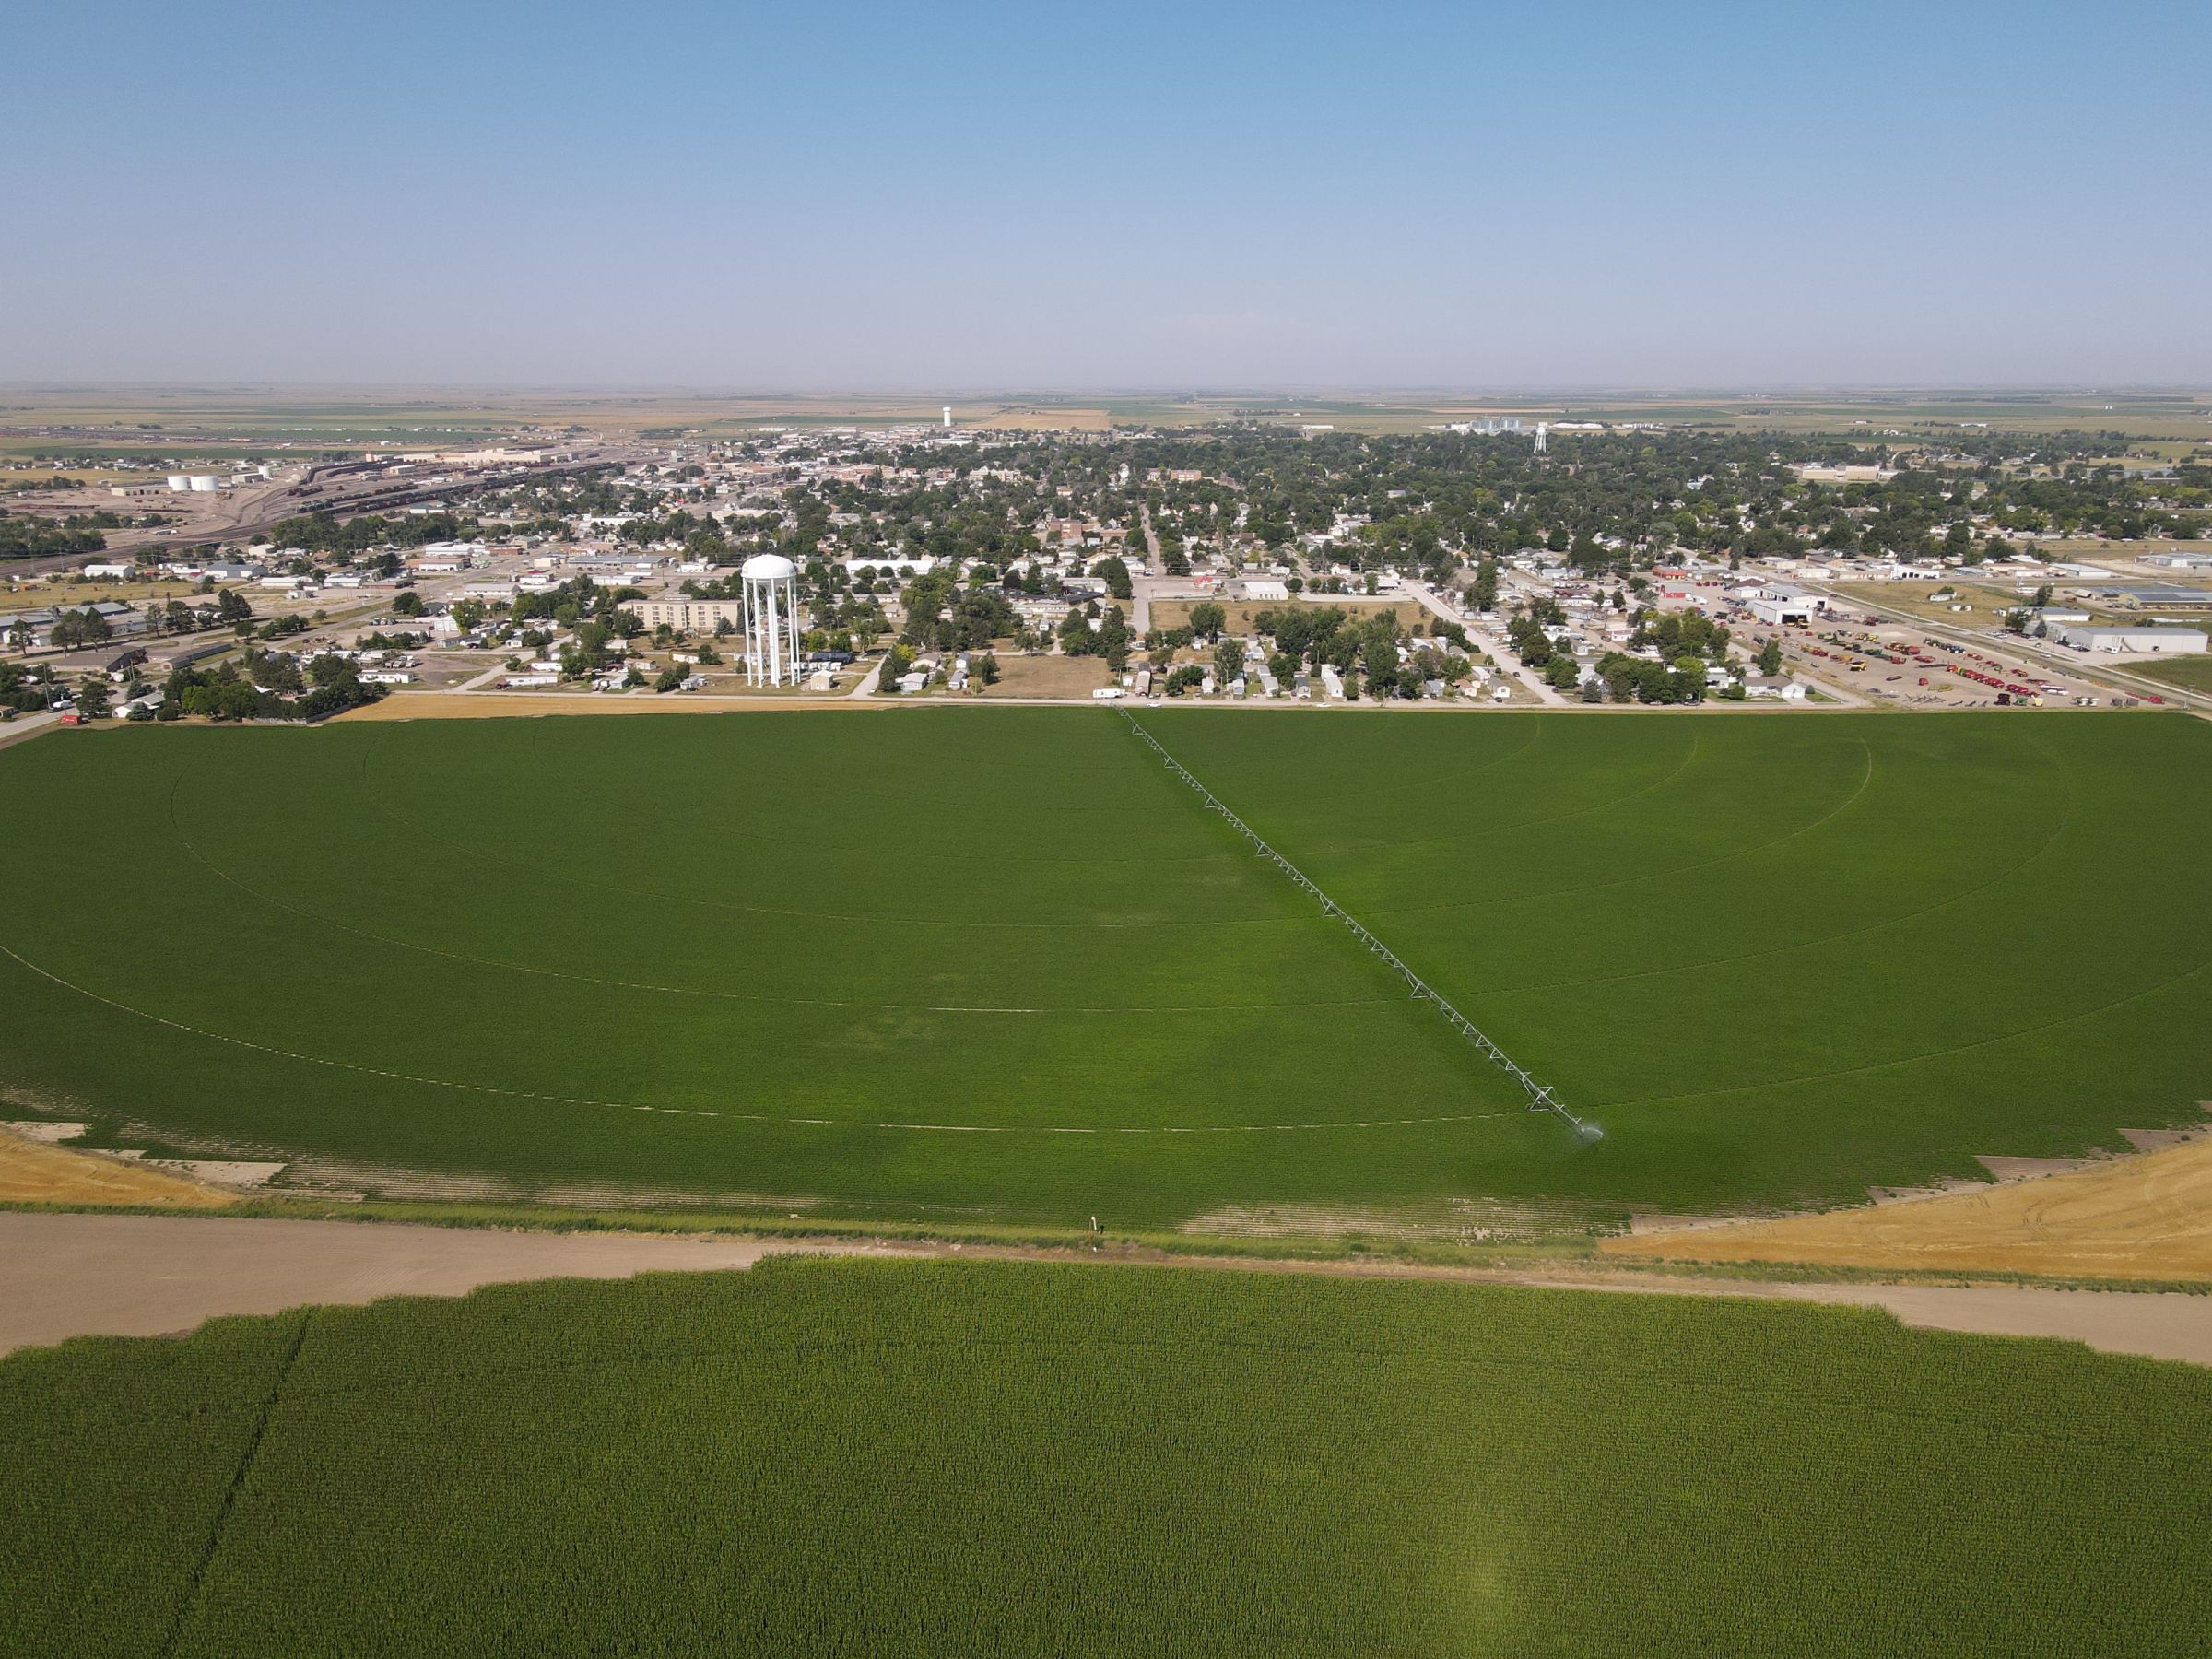 land-box-butte-county-nebraska-73-acres-listing-number-15097-0-2020-08-07-163547.JPG